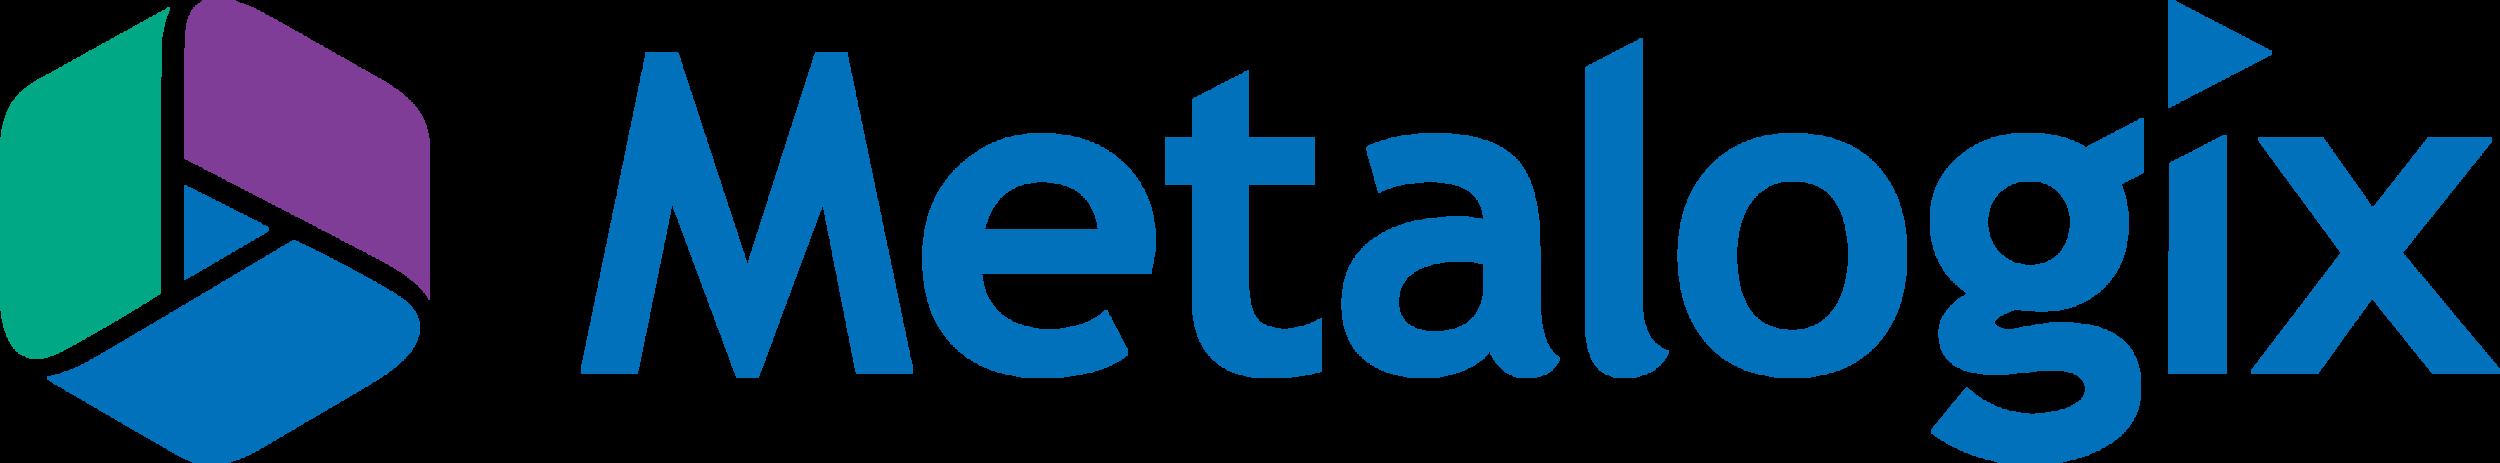 metalogix-logo-full.png